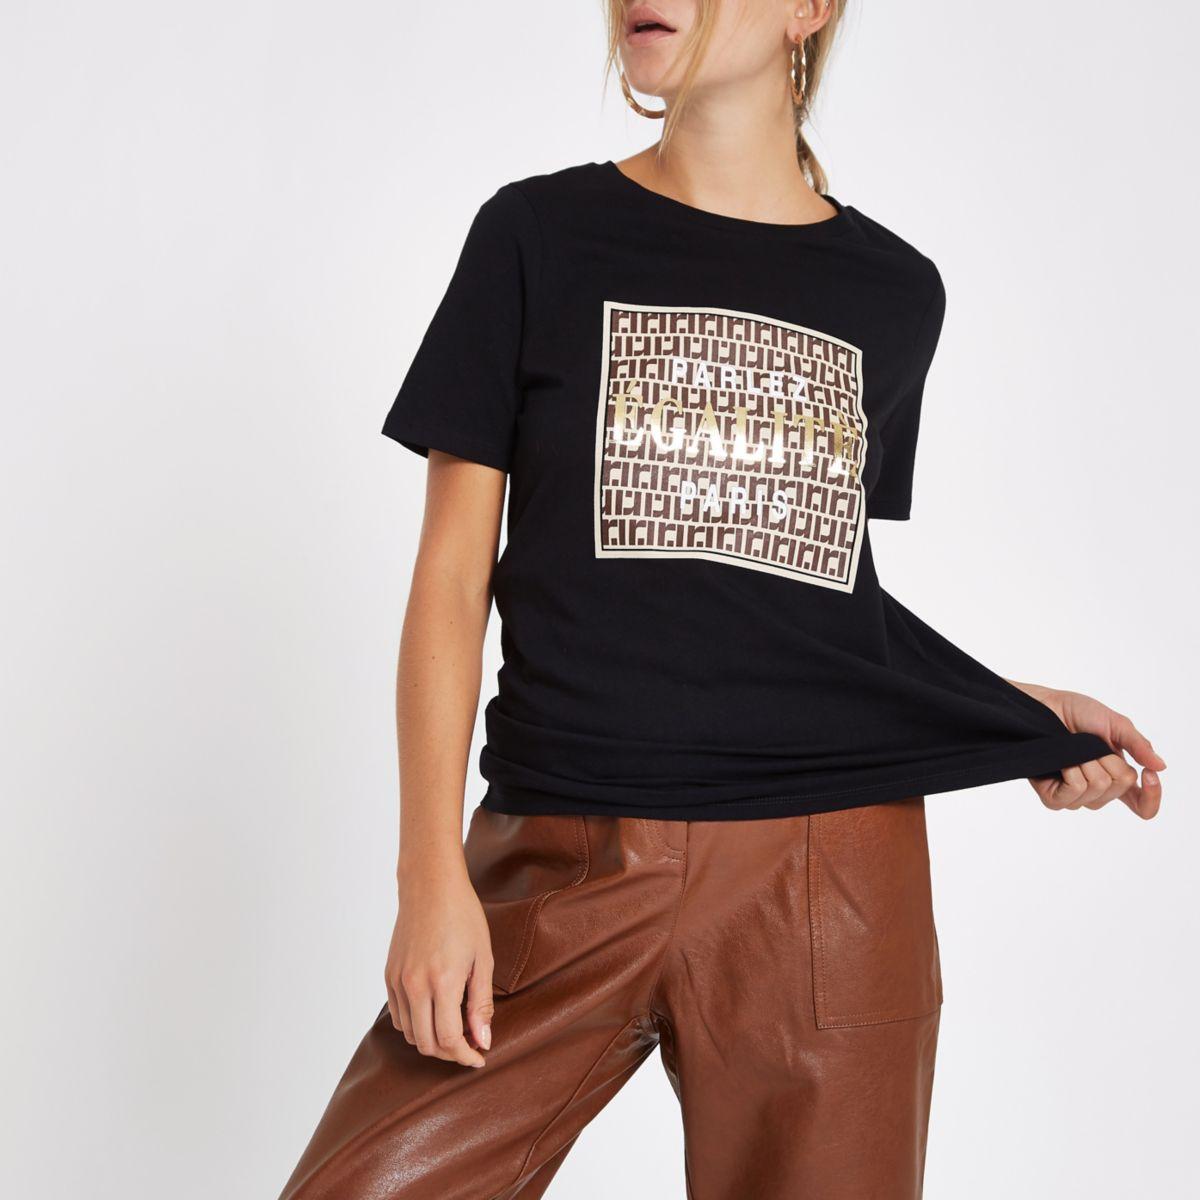 Black 'Egalite' front print t-shirt